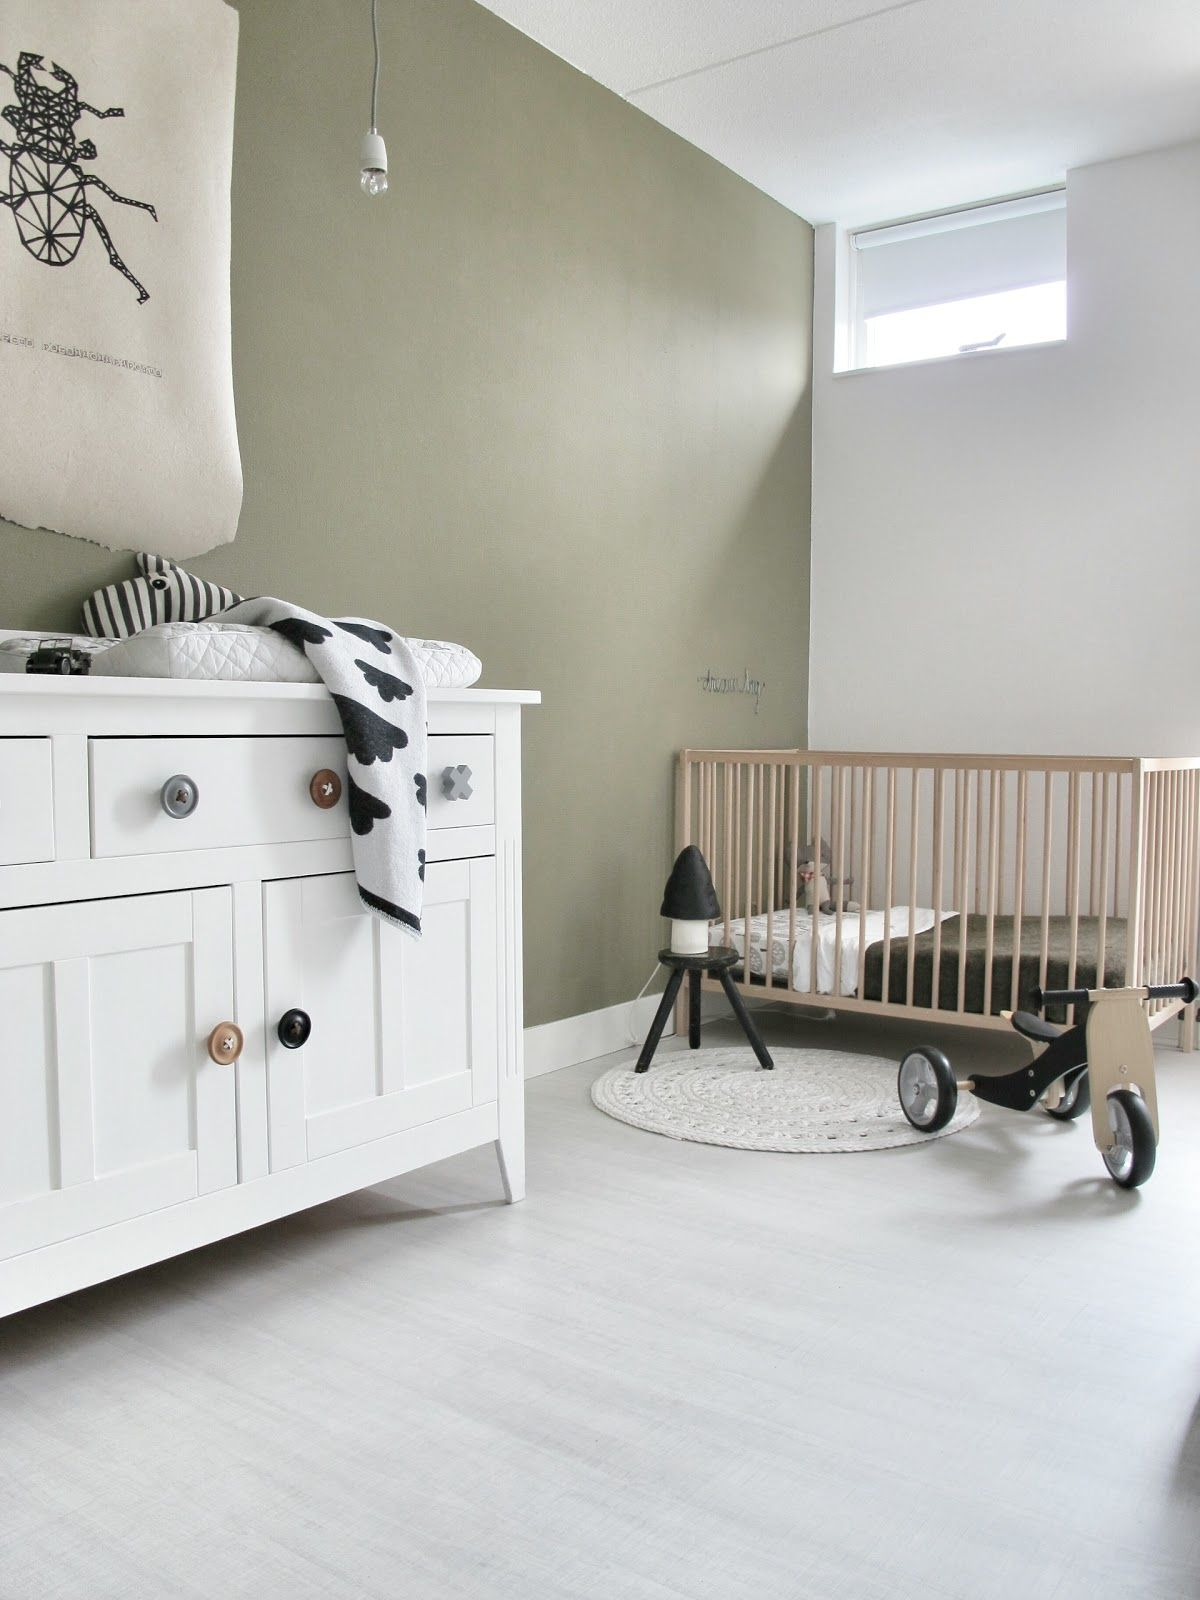 Babykamer met stoere kleur op de muur matte muurverf van for Kleur muur